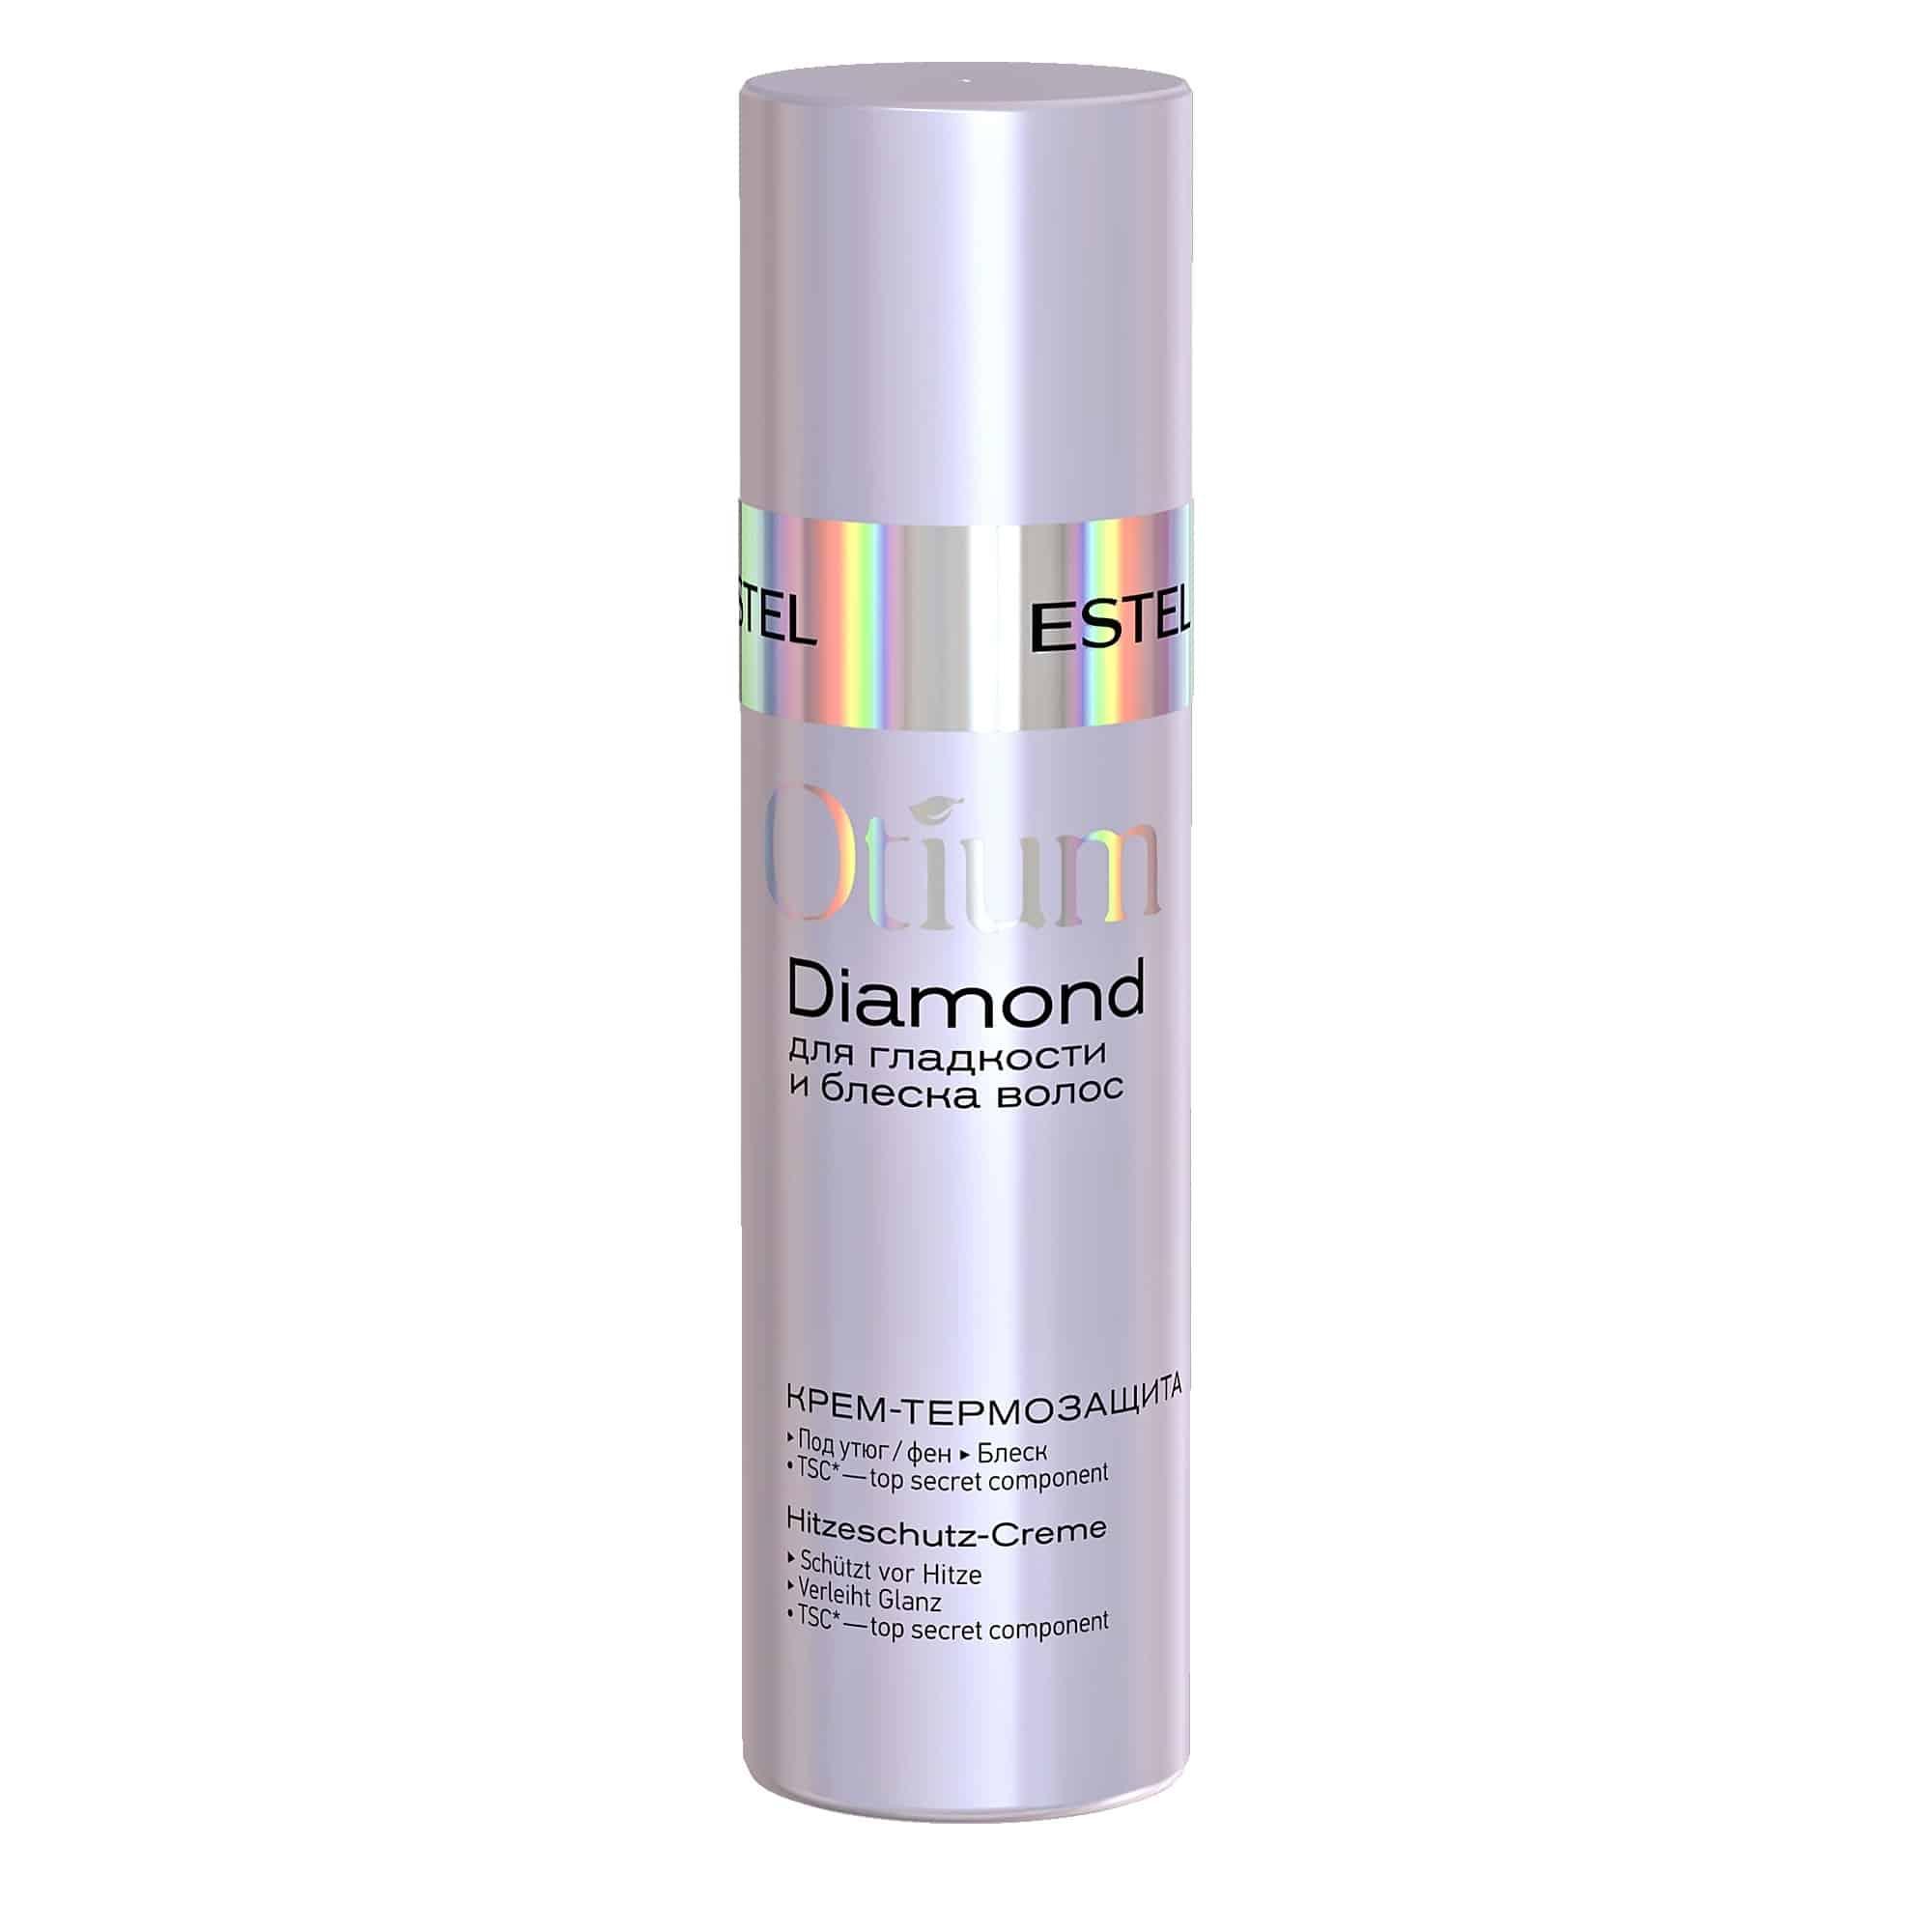 OTIUM DIAMOND Hitzeschutz-Creme